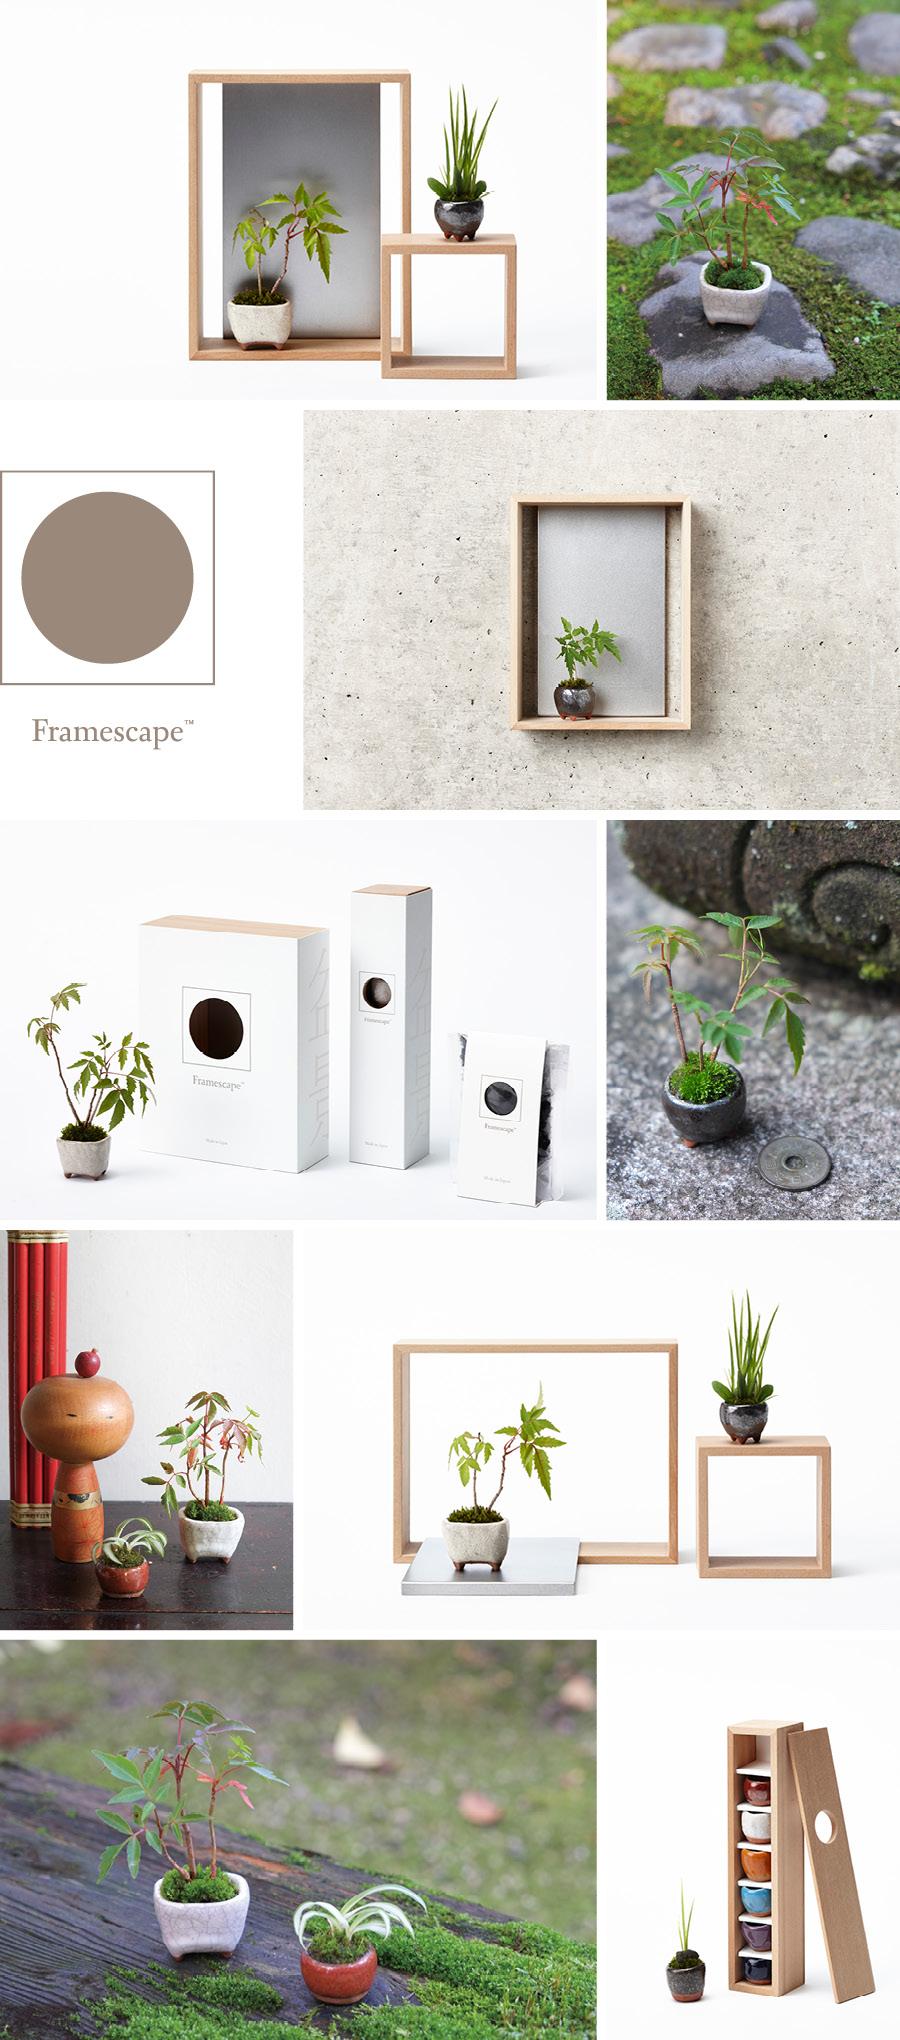 silent_framescape_01